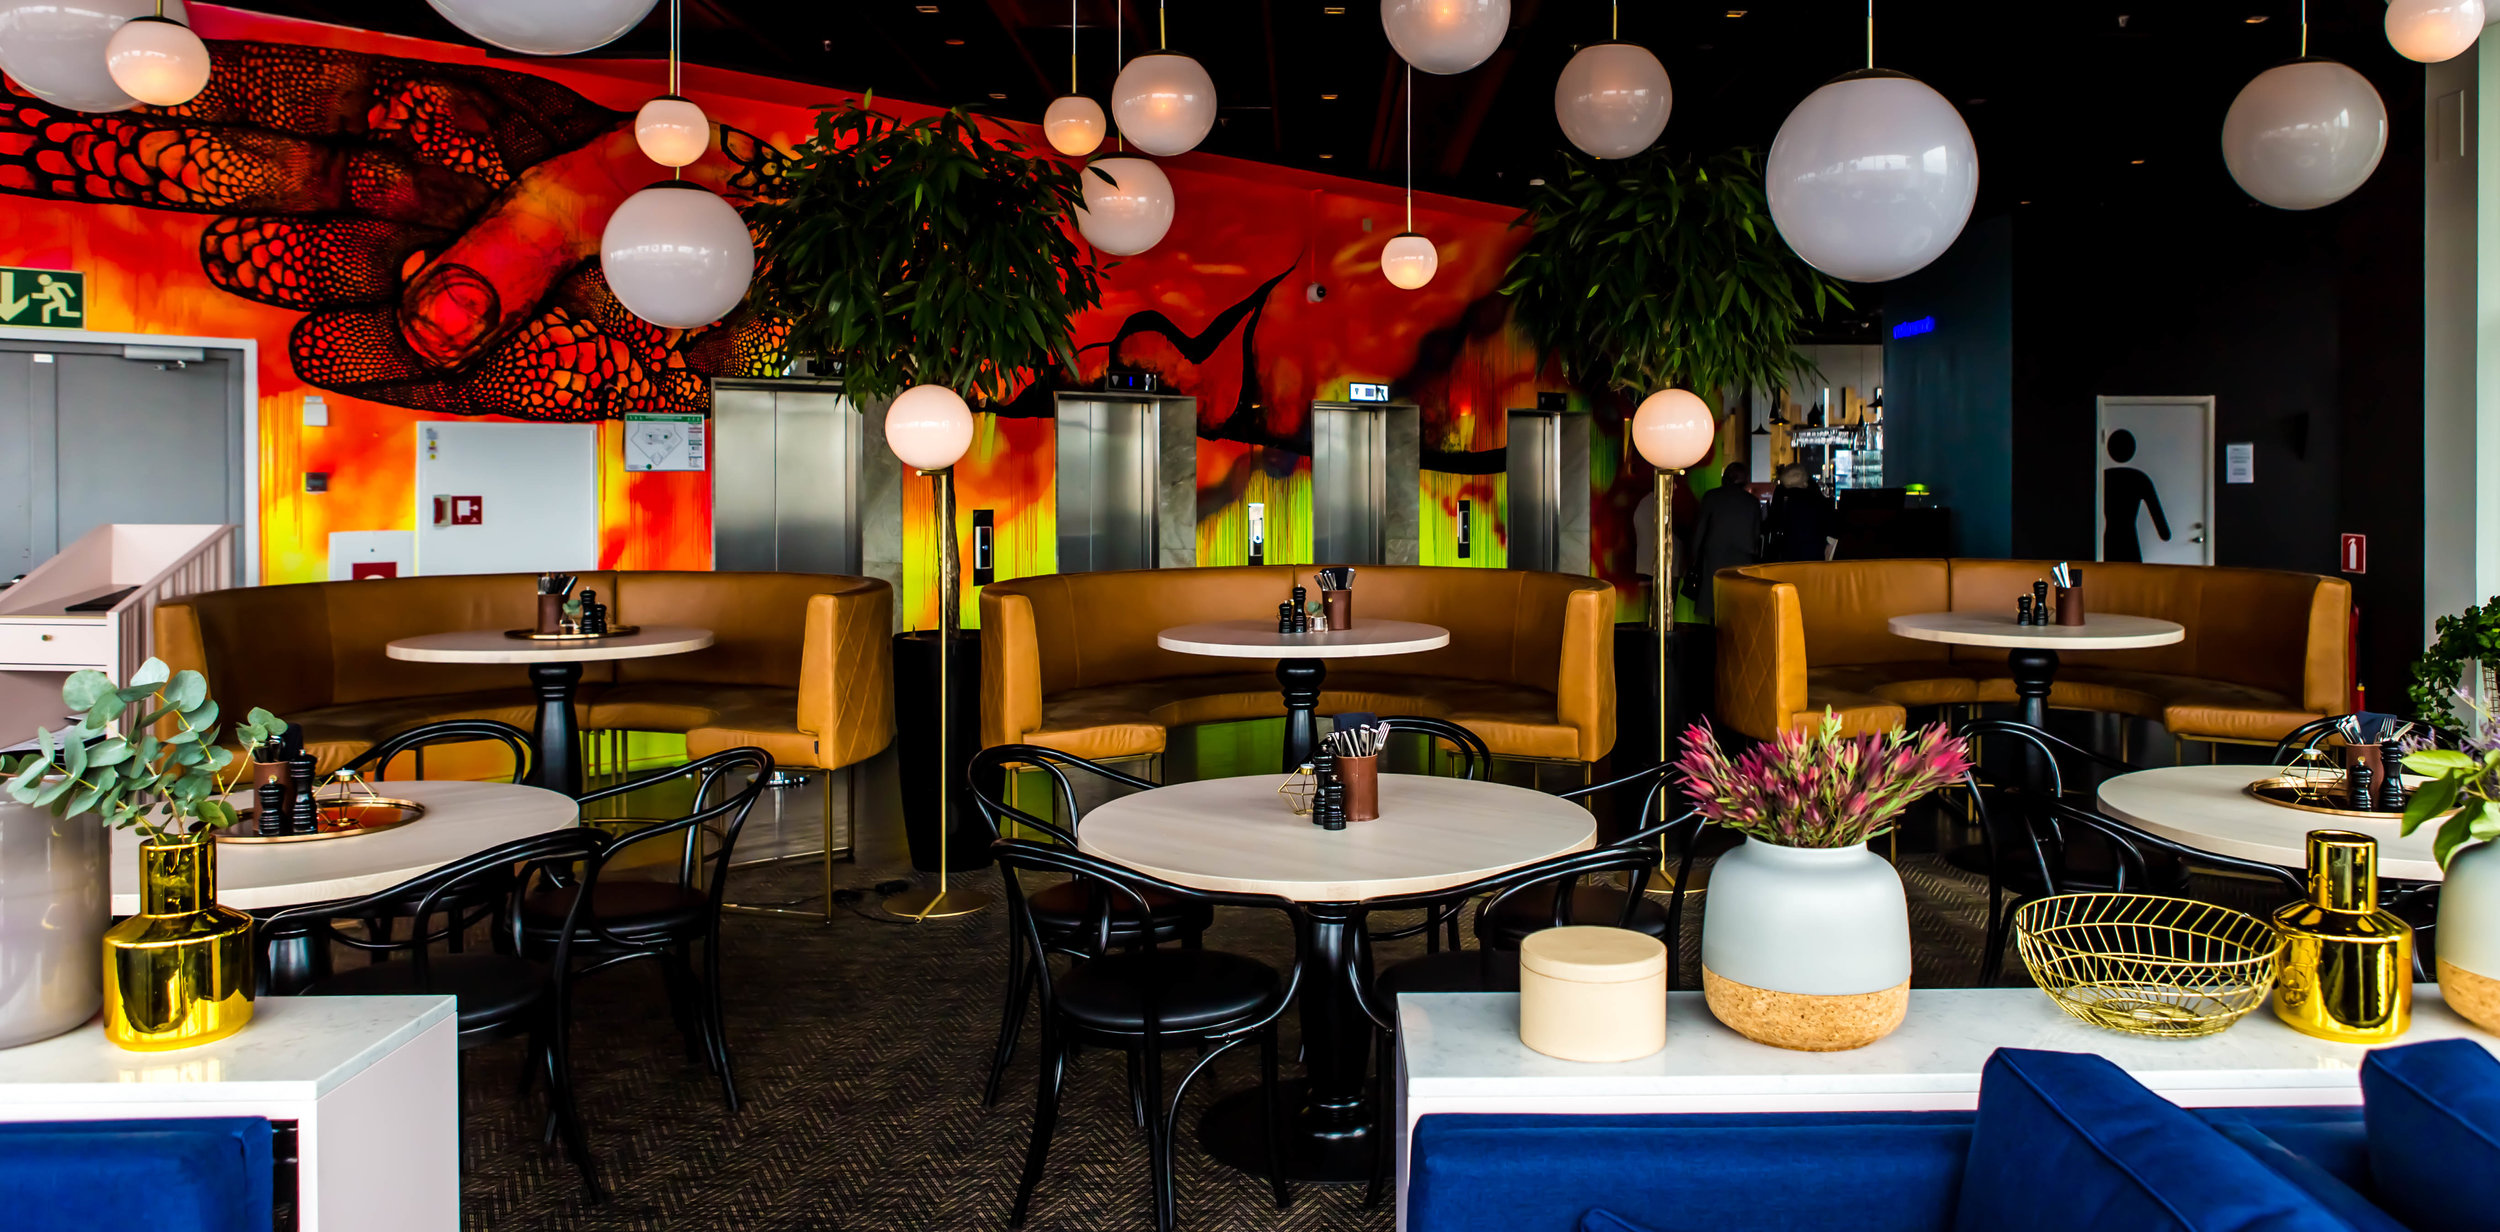 Sofa-restaurant-Heaven23-Gothenburg-Sweden-Facctory-photographer-Julio-Chang-4.jpg